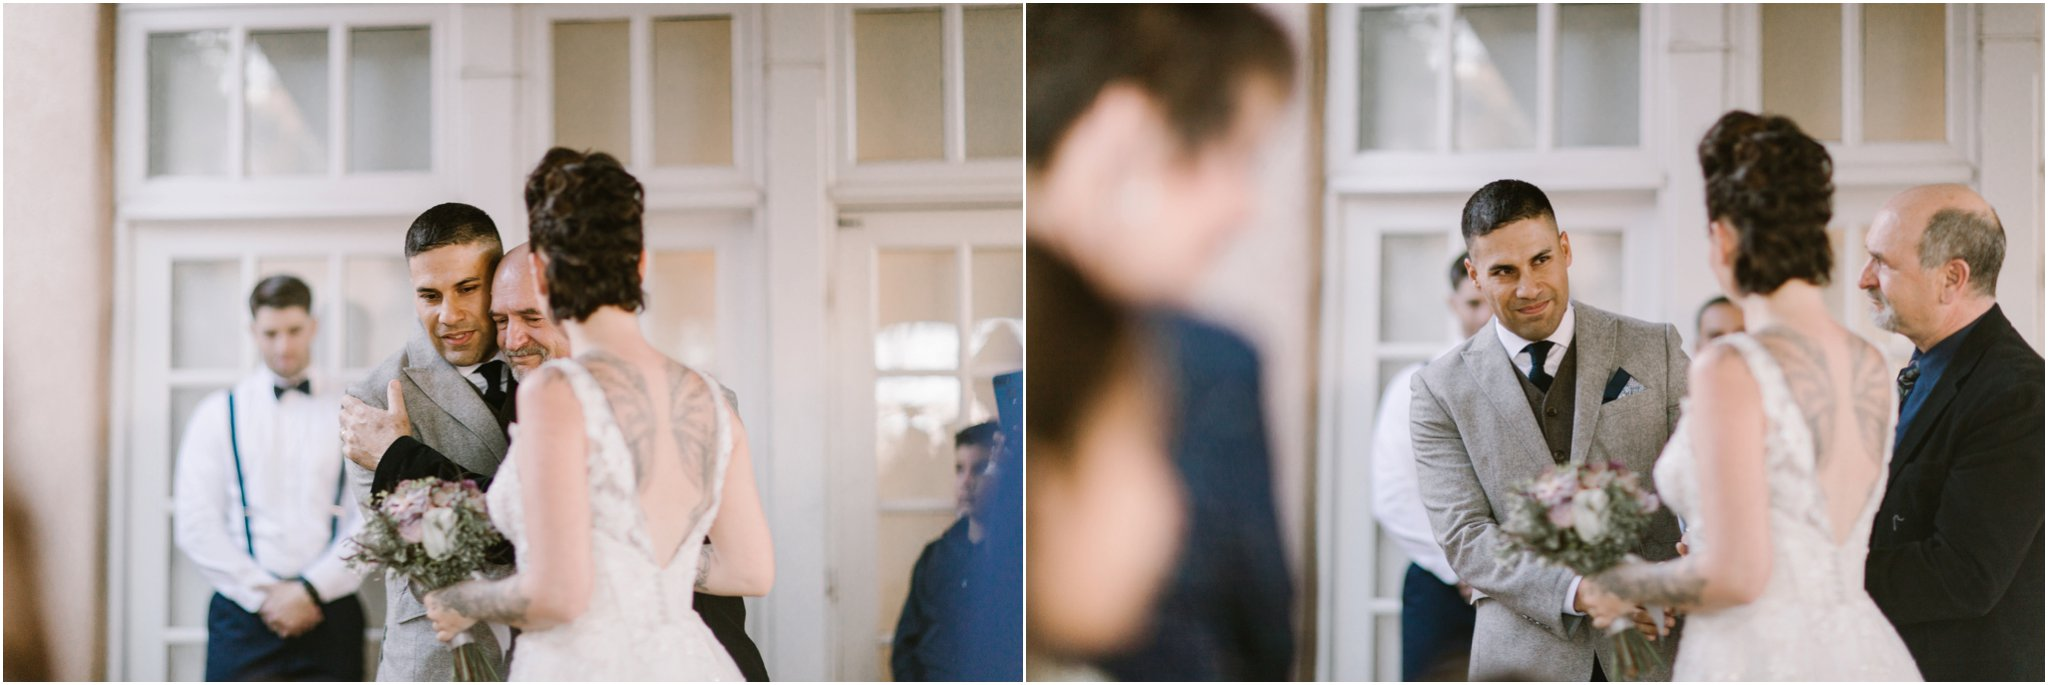 0029Blue Rose Photography_ Albuquerque and Santa Fe Wedding Photographer_ New Mexico Wedding Photography